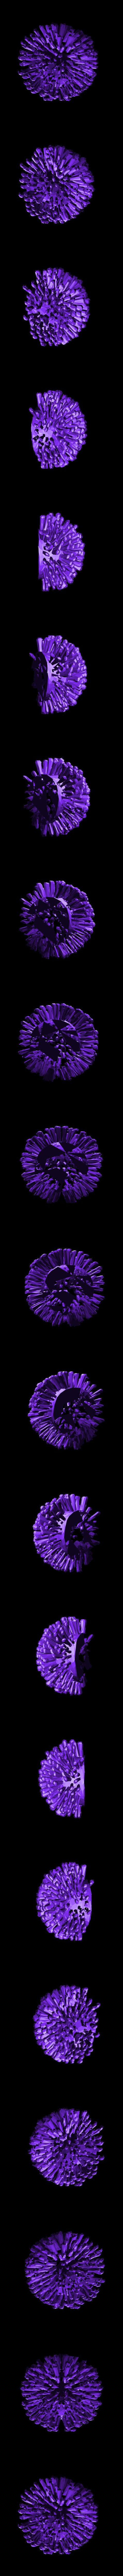 Flower Petal Center v2.stl Download free STL file Daisy - Flat flower • 3D printable template, mag-net